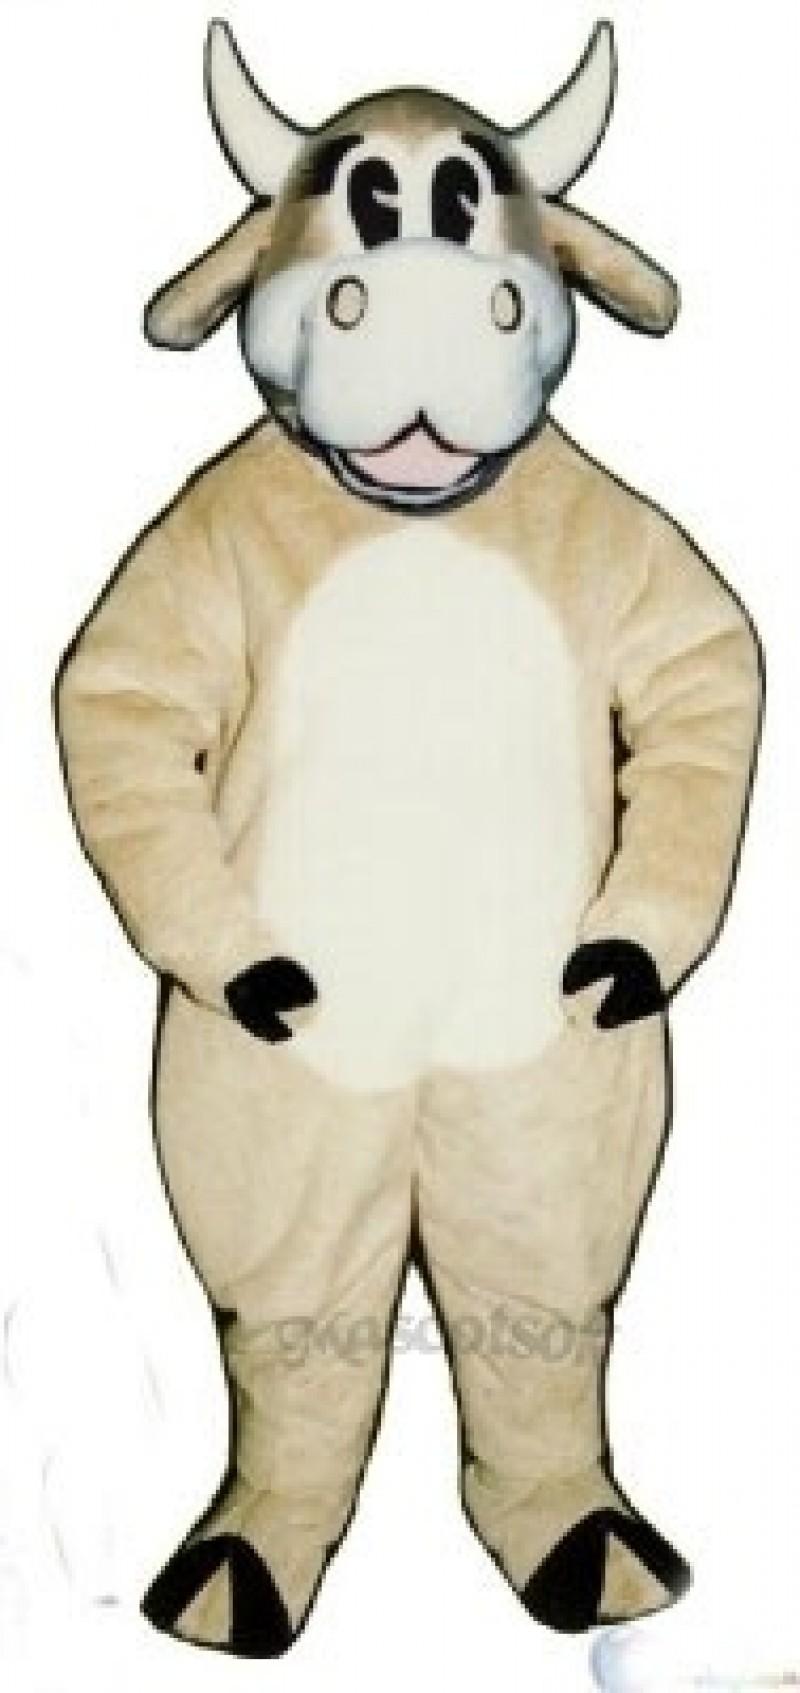 Jersey Jezebell Cattle Christmas Mascot Costume